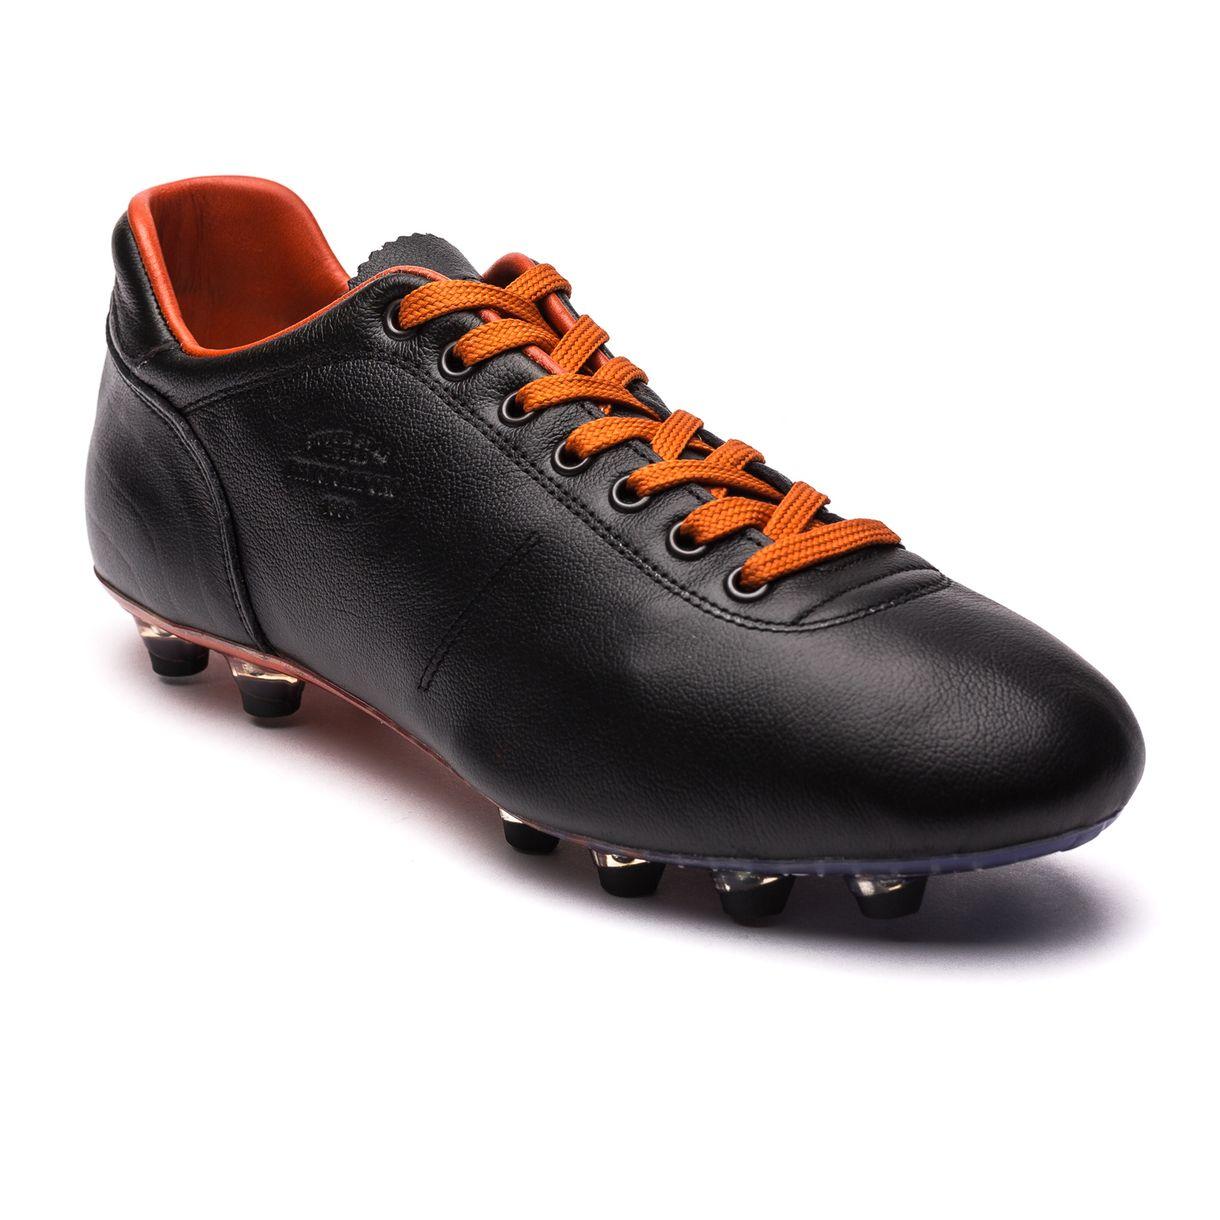 pantofola d 39 oro lazzarini miami fc fg black football boots football shirt blog. Black Bedroom Furniture Sets. Home Design Ideas